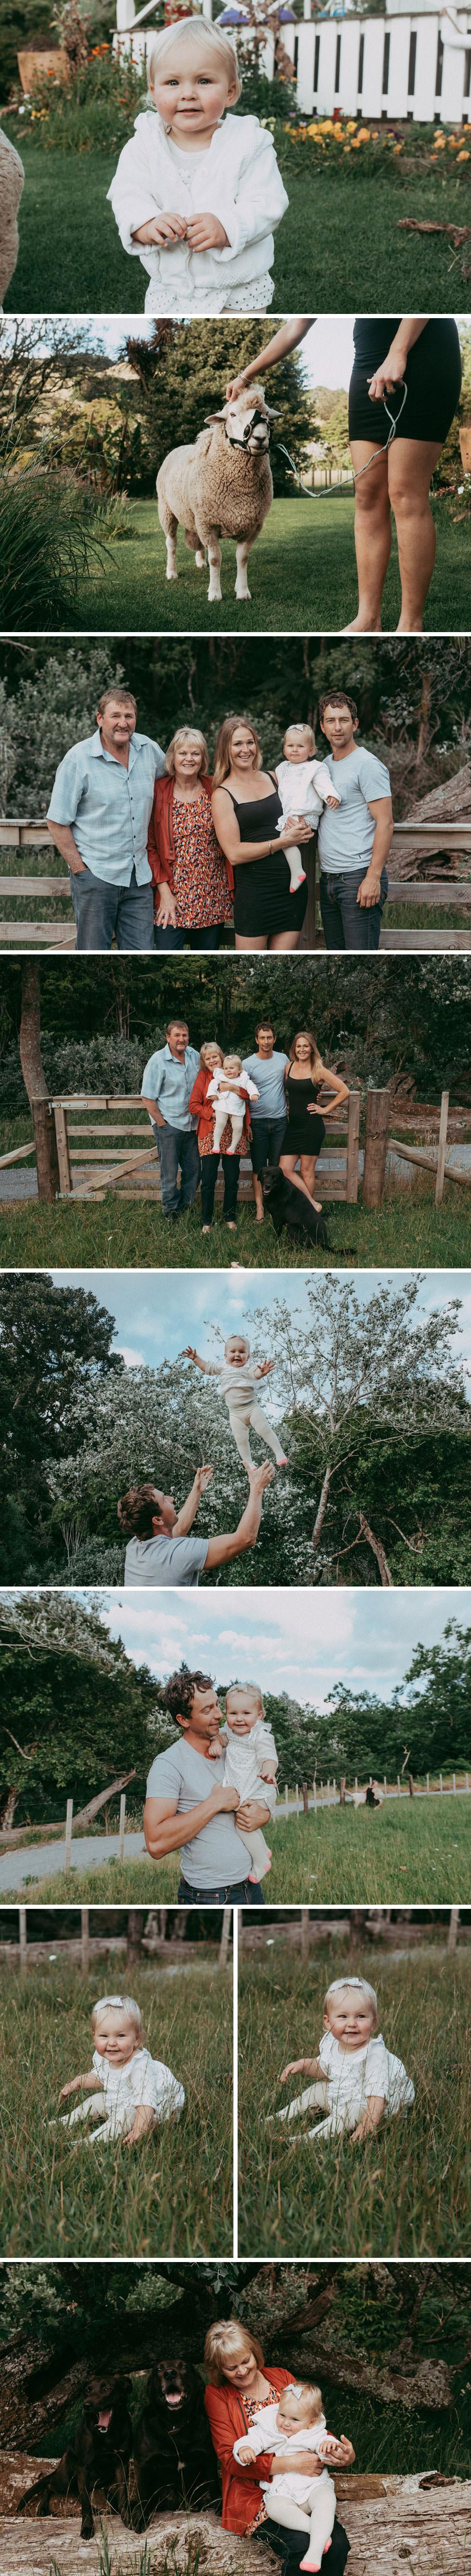 Photographer Jess Burges, Northland family photographer